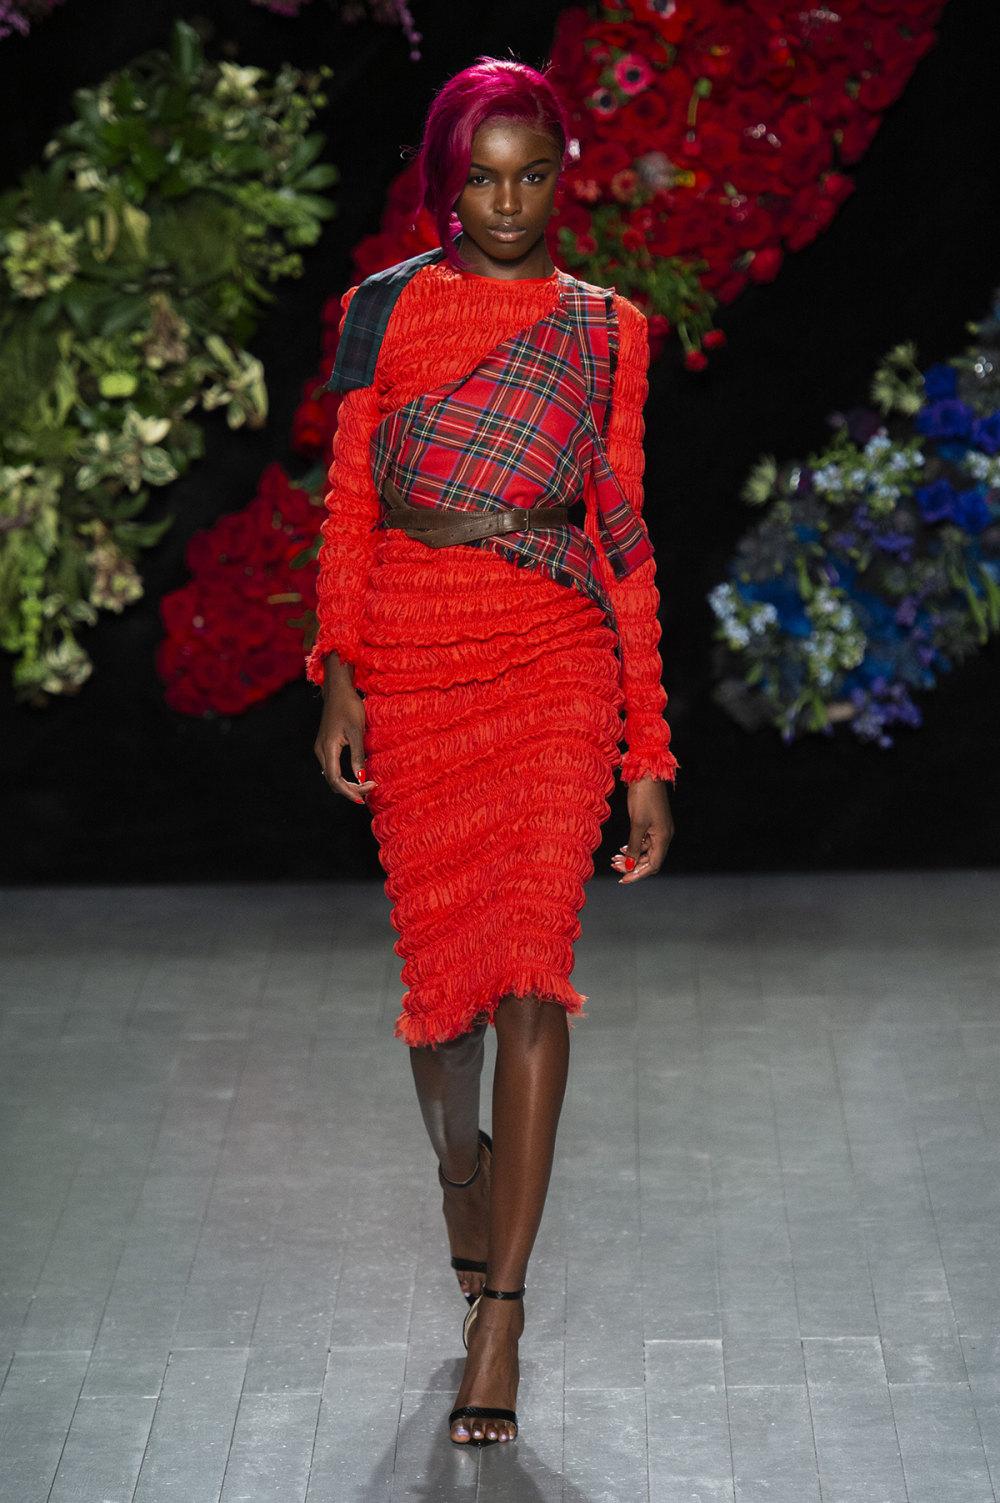 Roberta Einer时装系列格子呢西装外套收紧腰部霓虹色腰带连帽衫-2.jpg